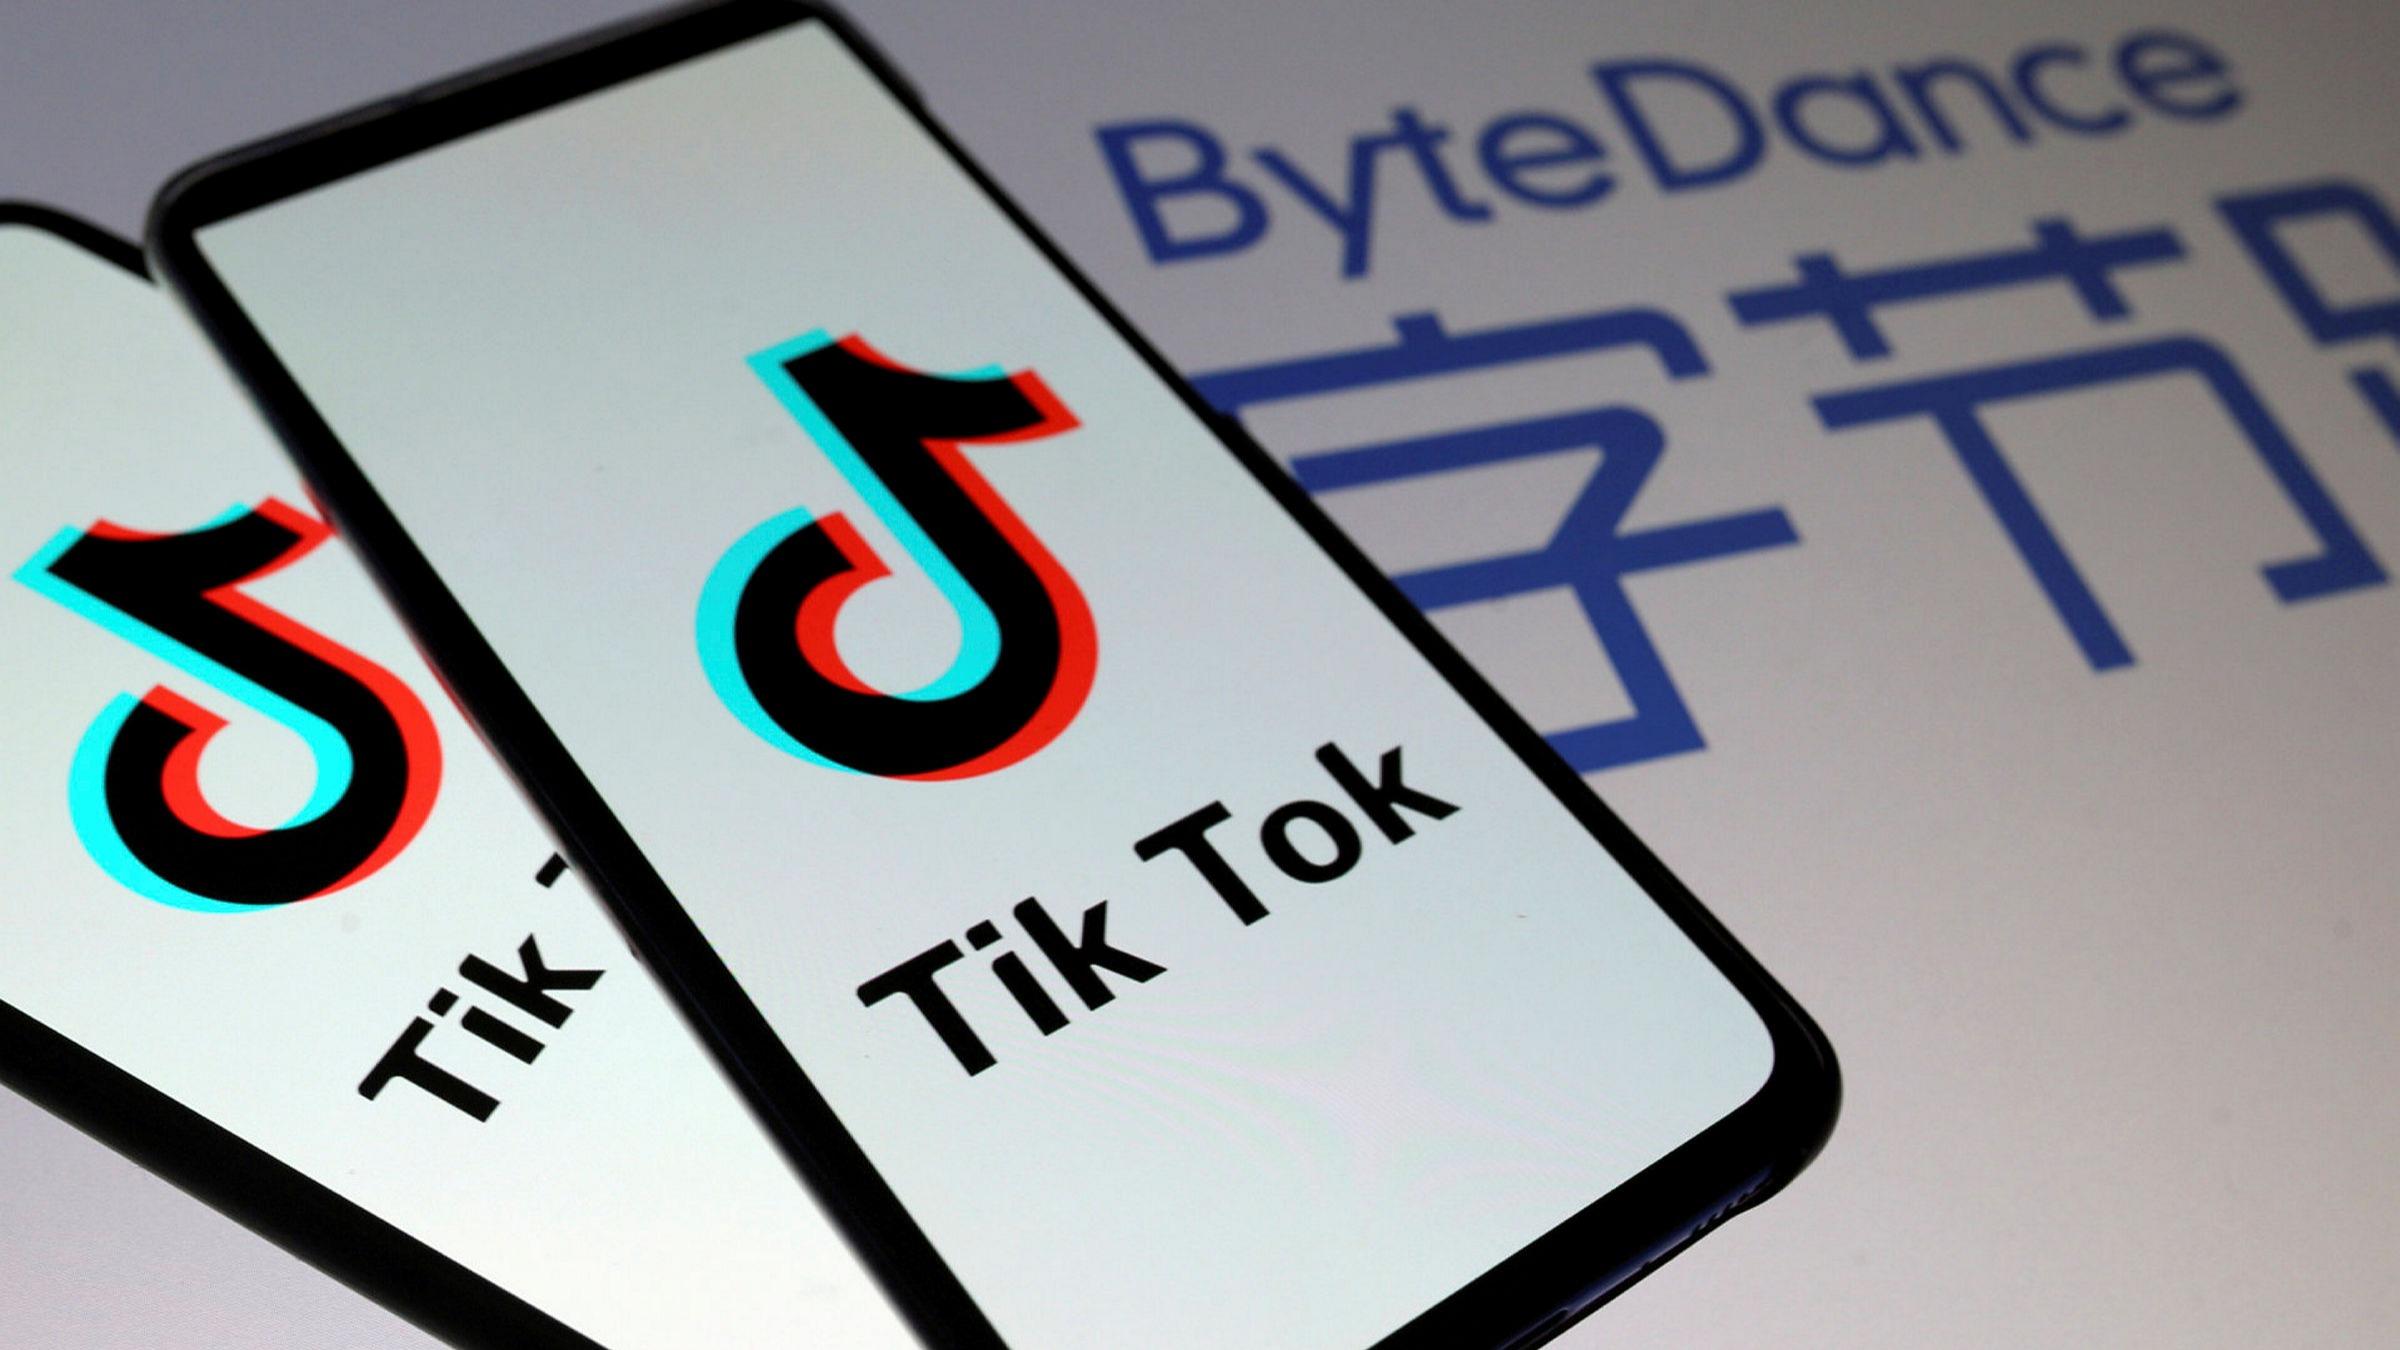 TikTok - وزارت بازرگانی آمریکا قویا از ممنوعیت تیک تاک دفاع می کند